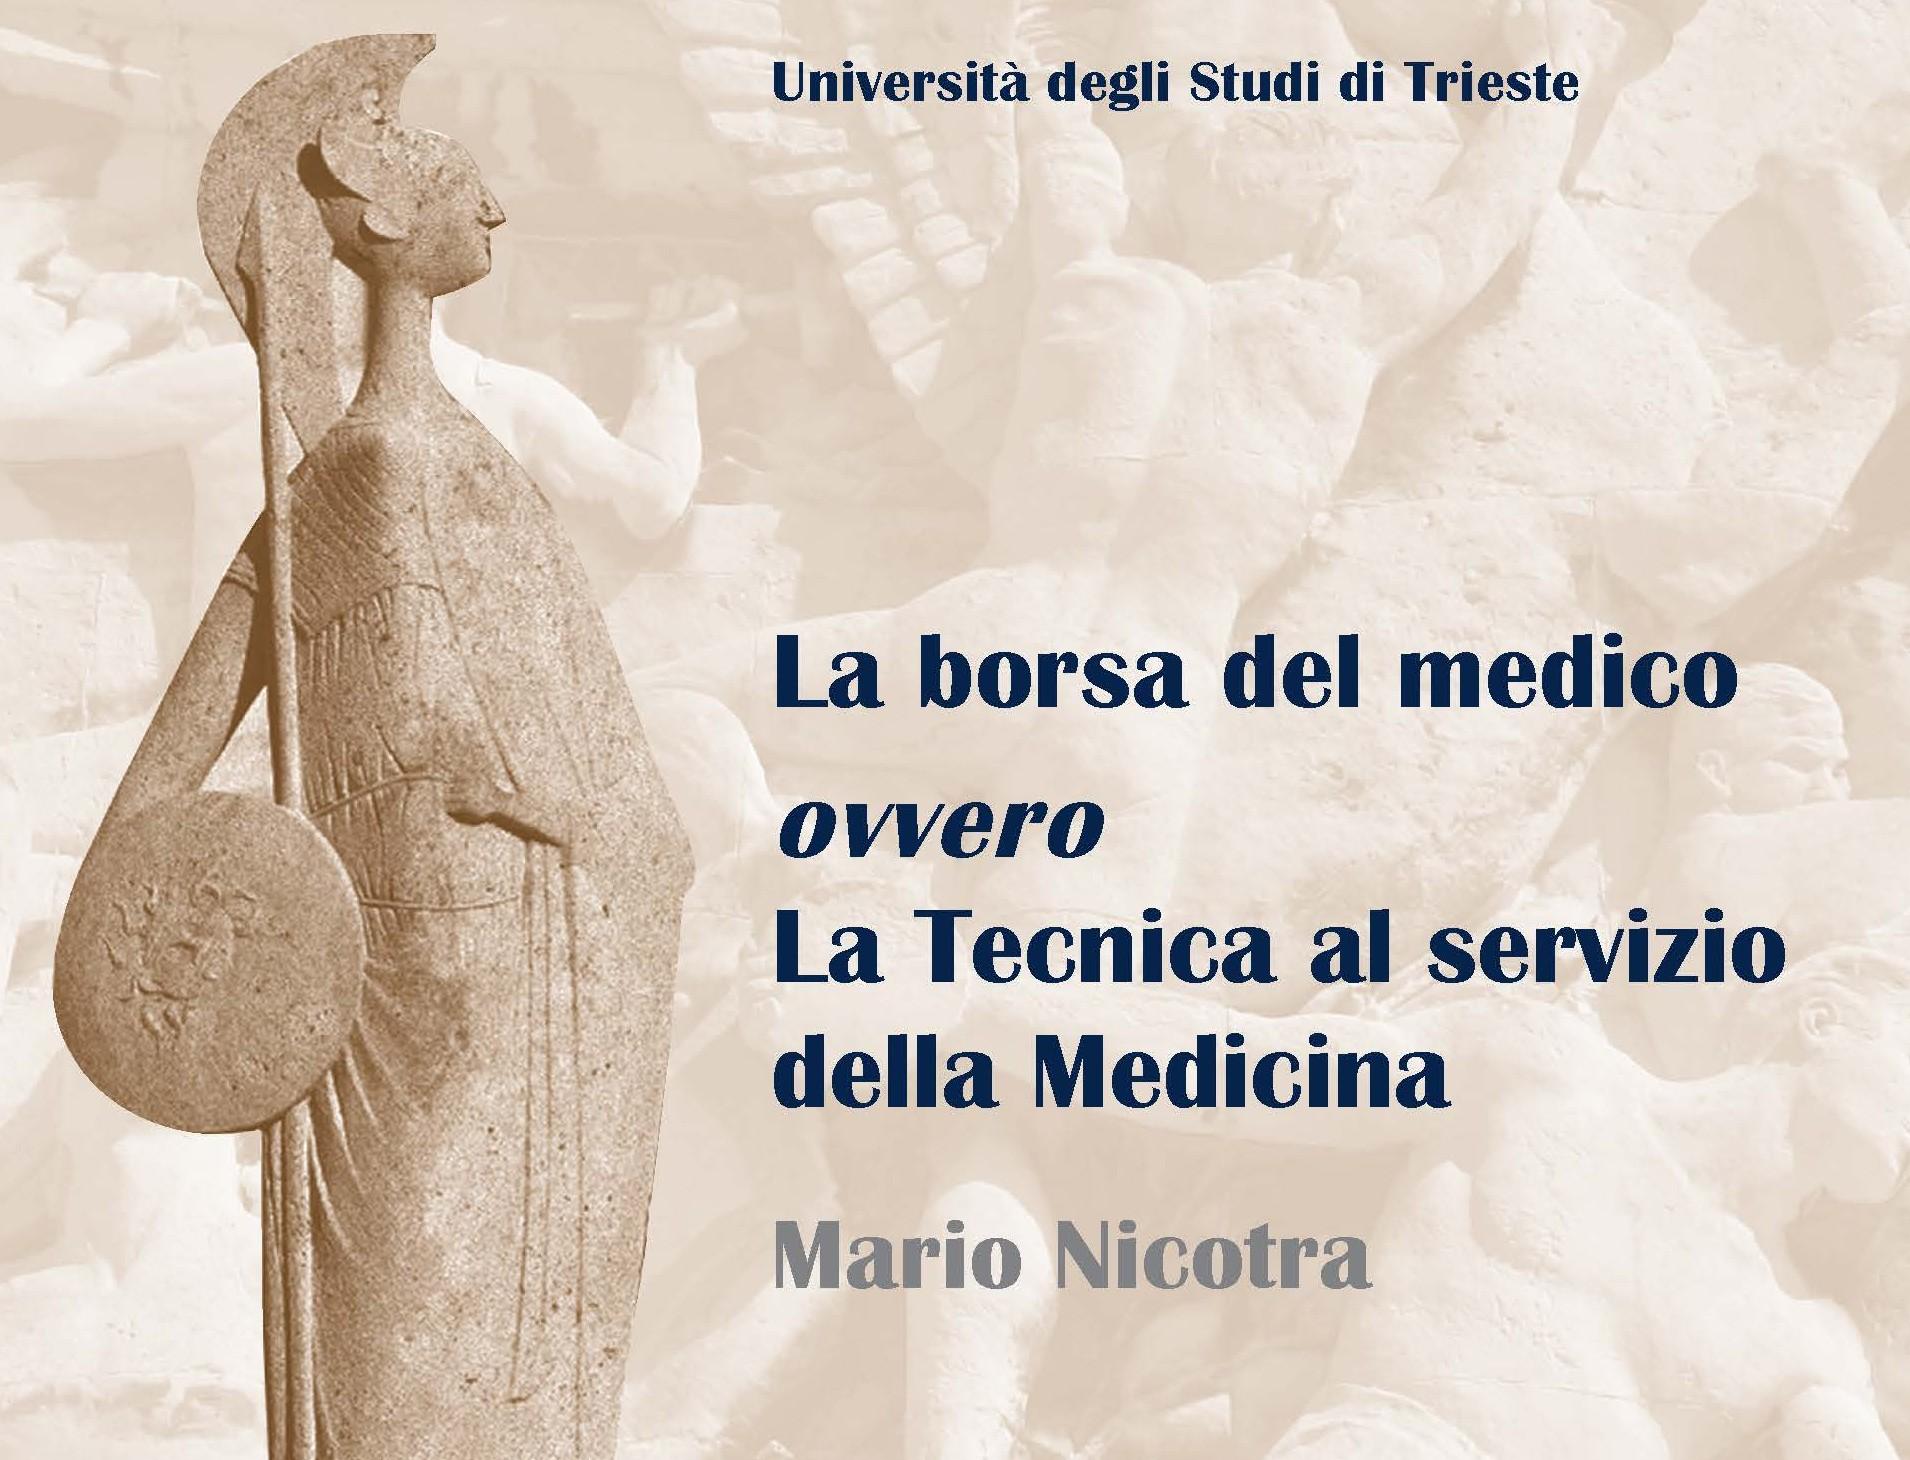 copNicotraBorsa_medico